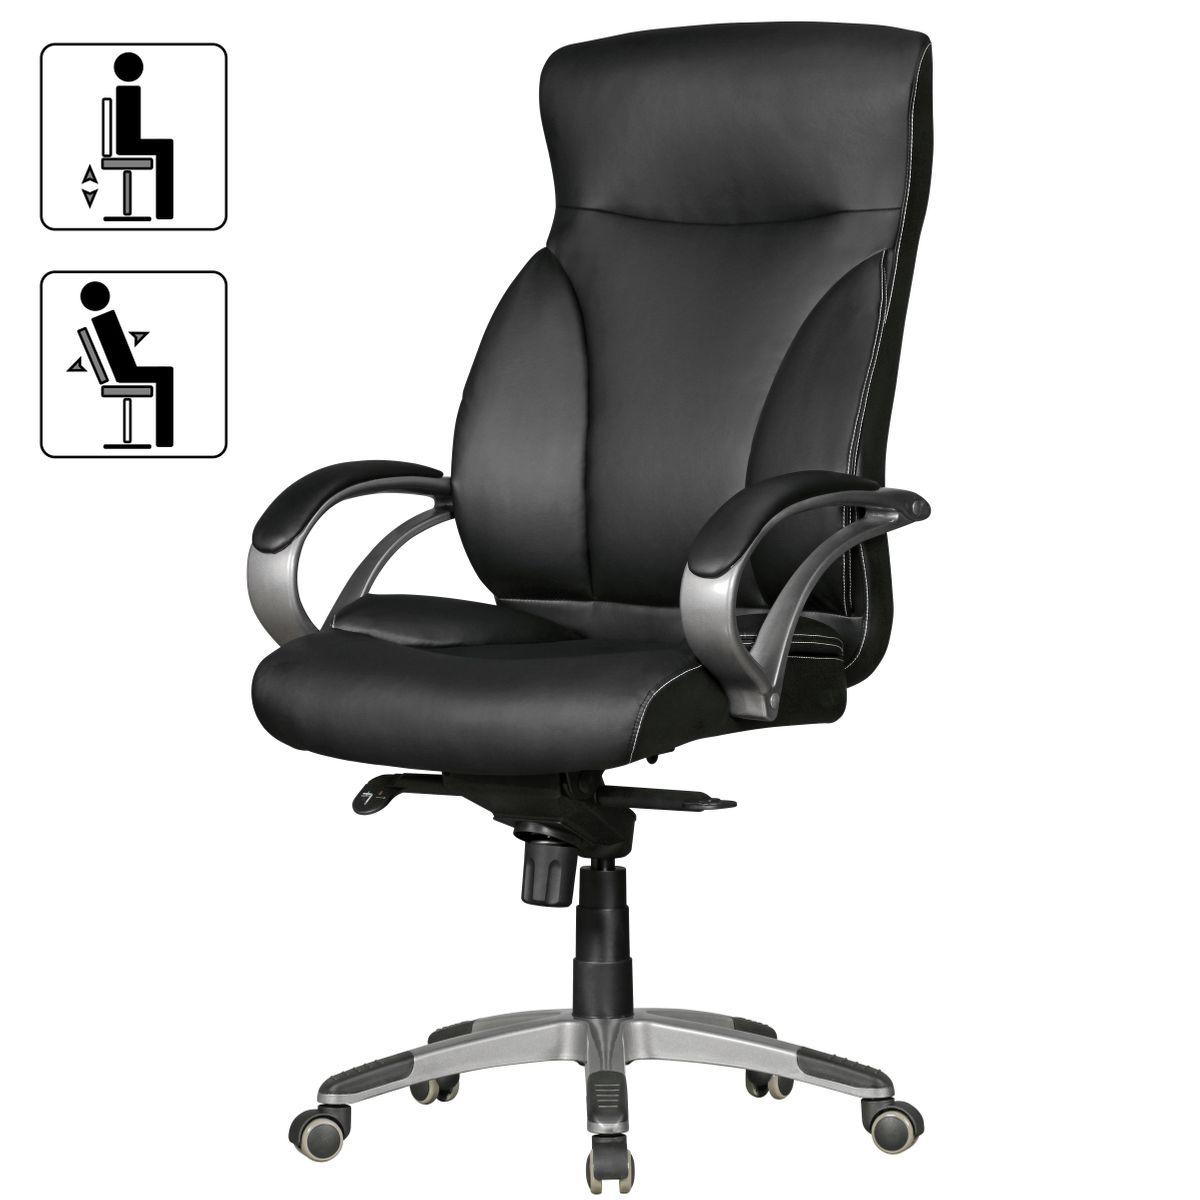 b rostuhl ergonomisch schreibtischstuhl kunstleder. Black Bedroom Furniture Sets. Home Design Ideas